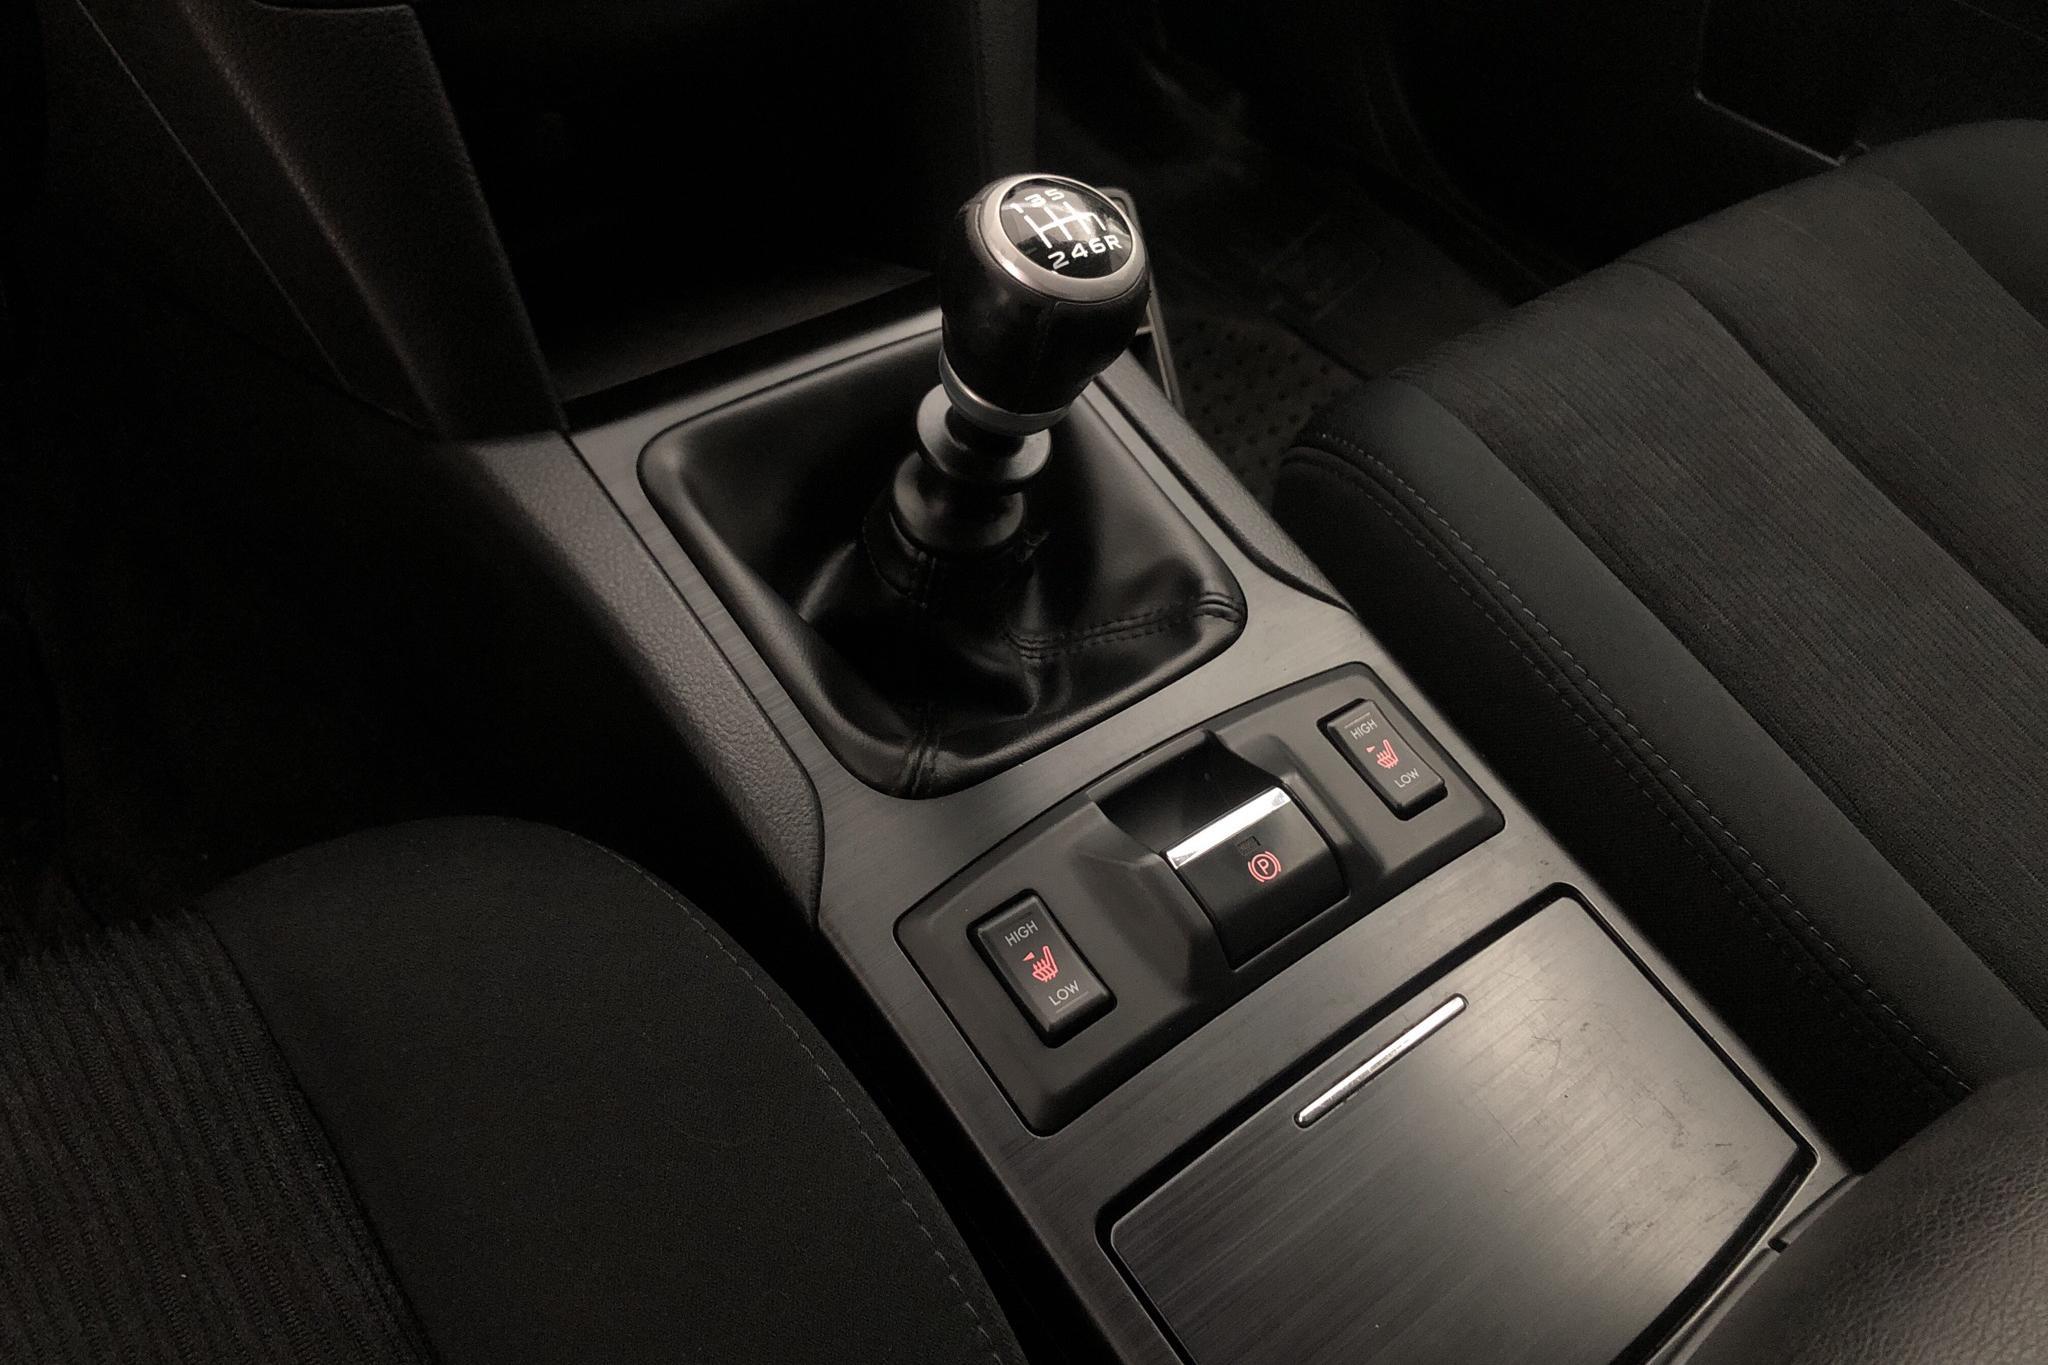 Subaru Outback 2.0D (150hk) - 189 250 km - Manual - silver - 2014